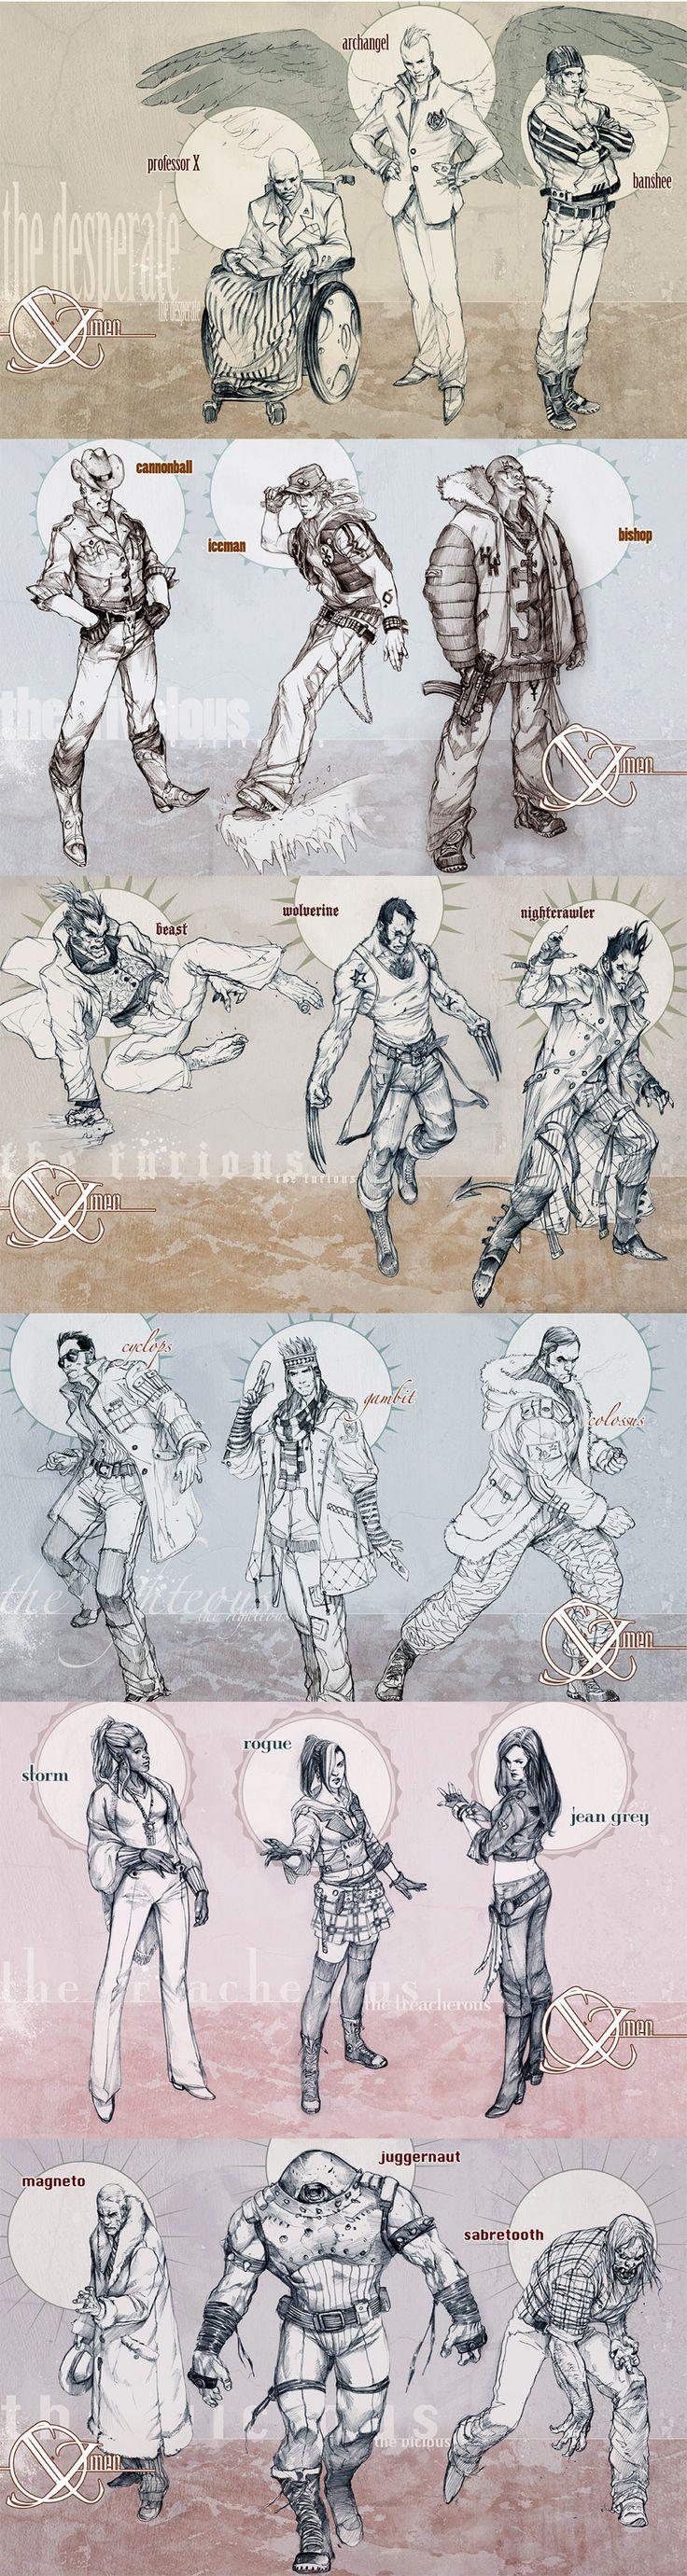 X-Men by Marko Djurdjevic #Redesign #Mutants. Woah dude look at Nightcrawler and Archangel! So cool!